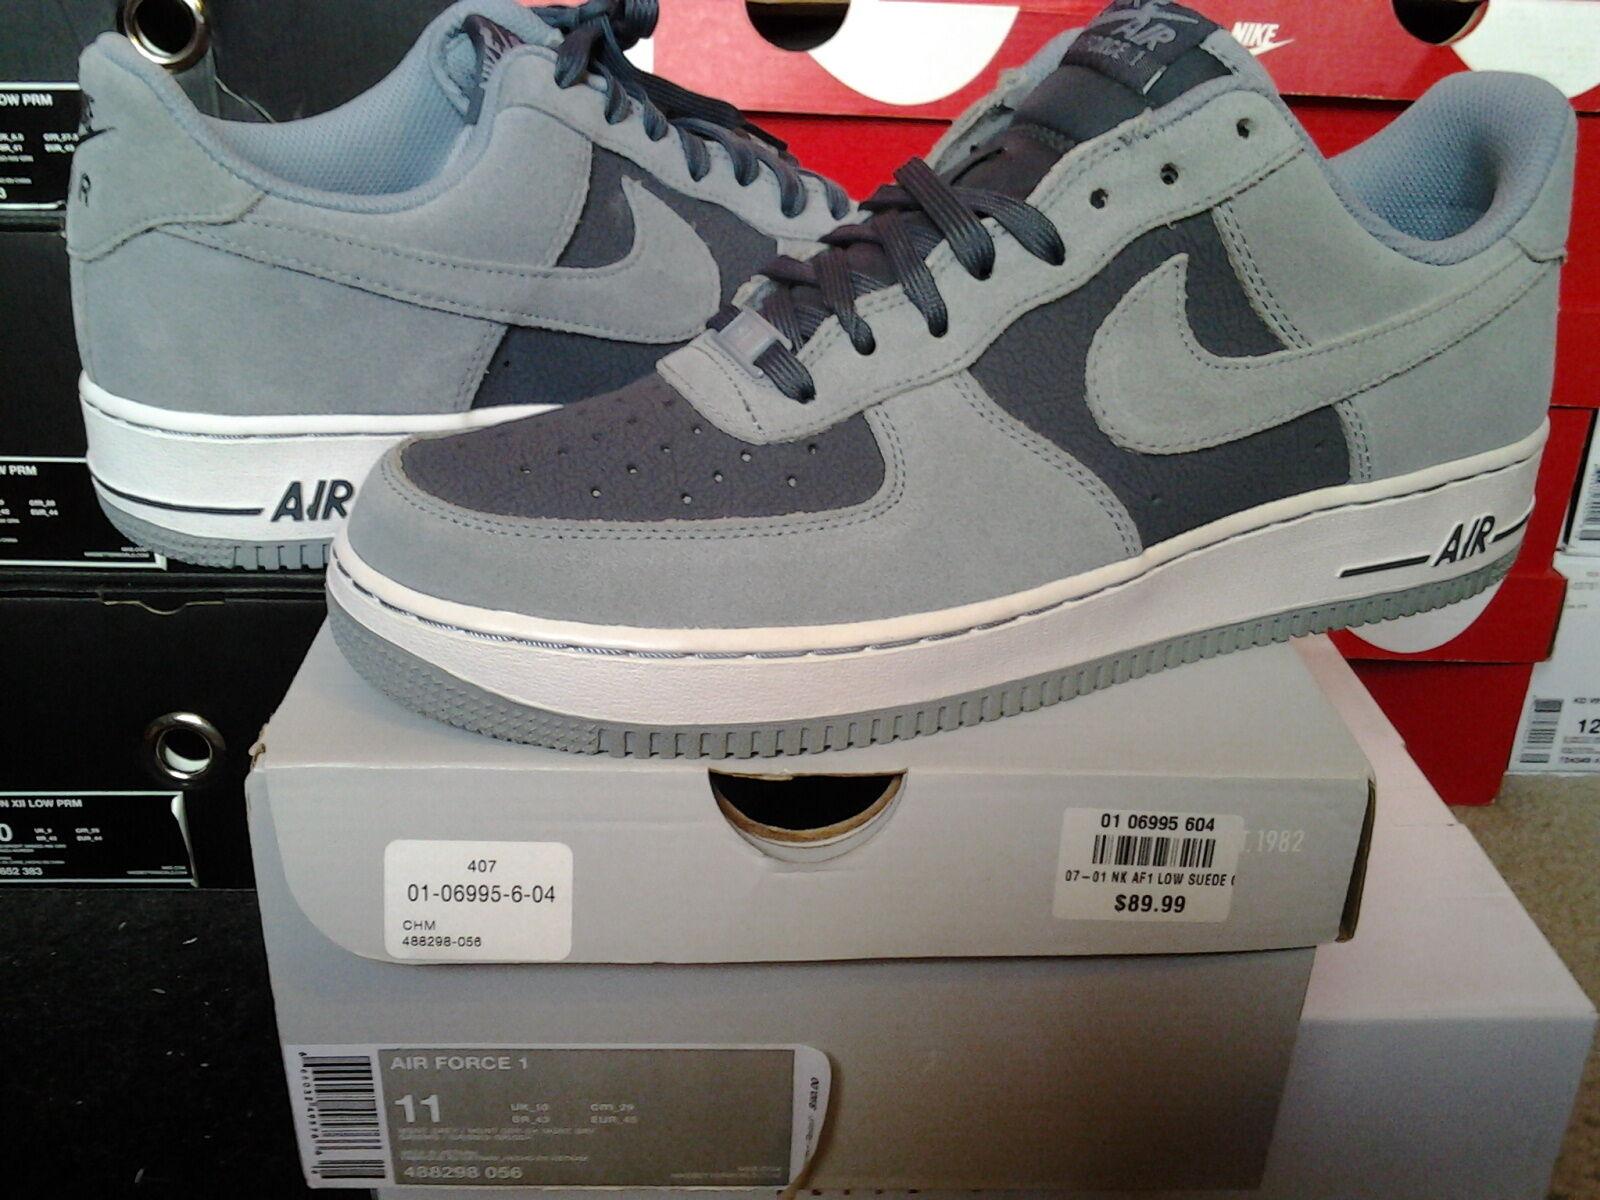 Nike Air Force One 1 Low 07 Dark Magnet Grey White dunk sb mid high I 488298 056